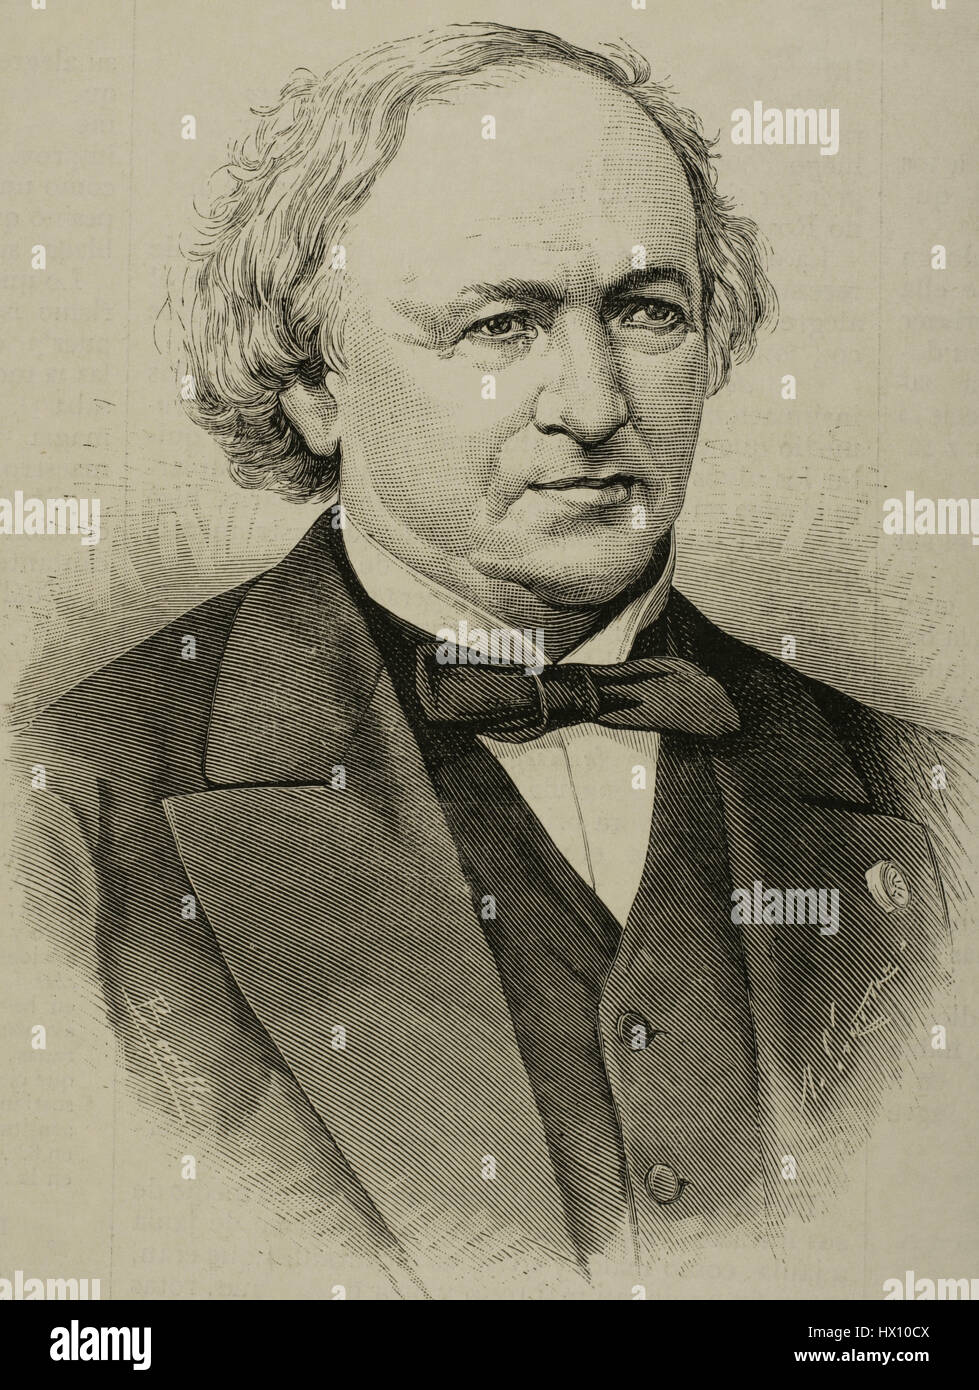 Jean Baptiste Andre Dumas (1800-1884). French chemist. Portrait. Engraving by Arturo Carretero. 'La Ilustracion - Stock Image